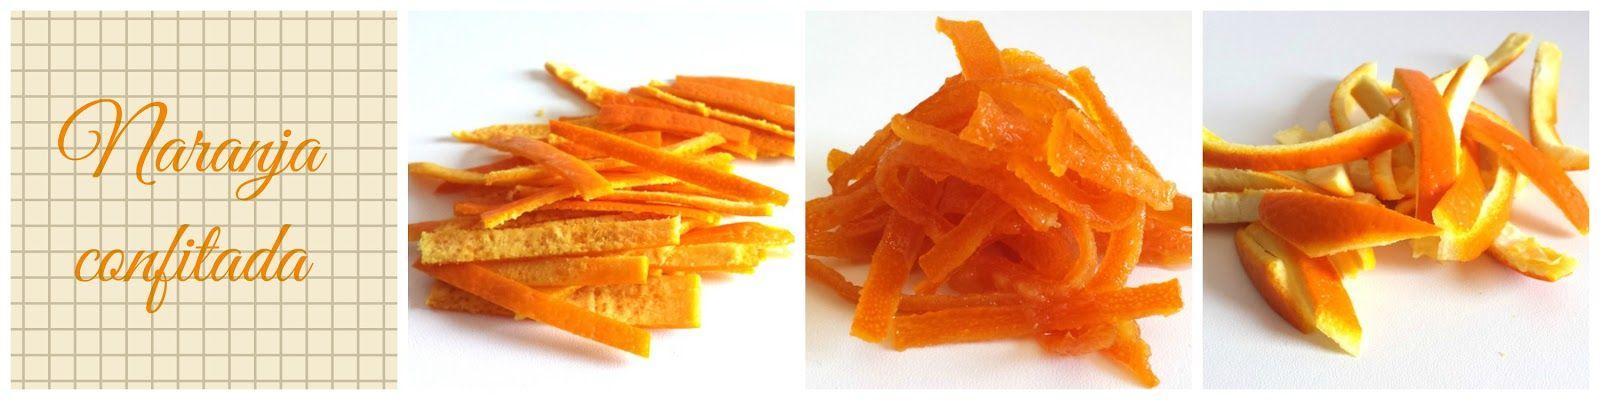 Sweet Pepitas Cómo Hacer Piel De Naranja Confitada Piel De Naranja Naranja Confitada Naranja